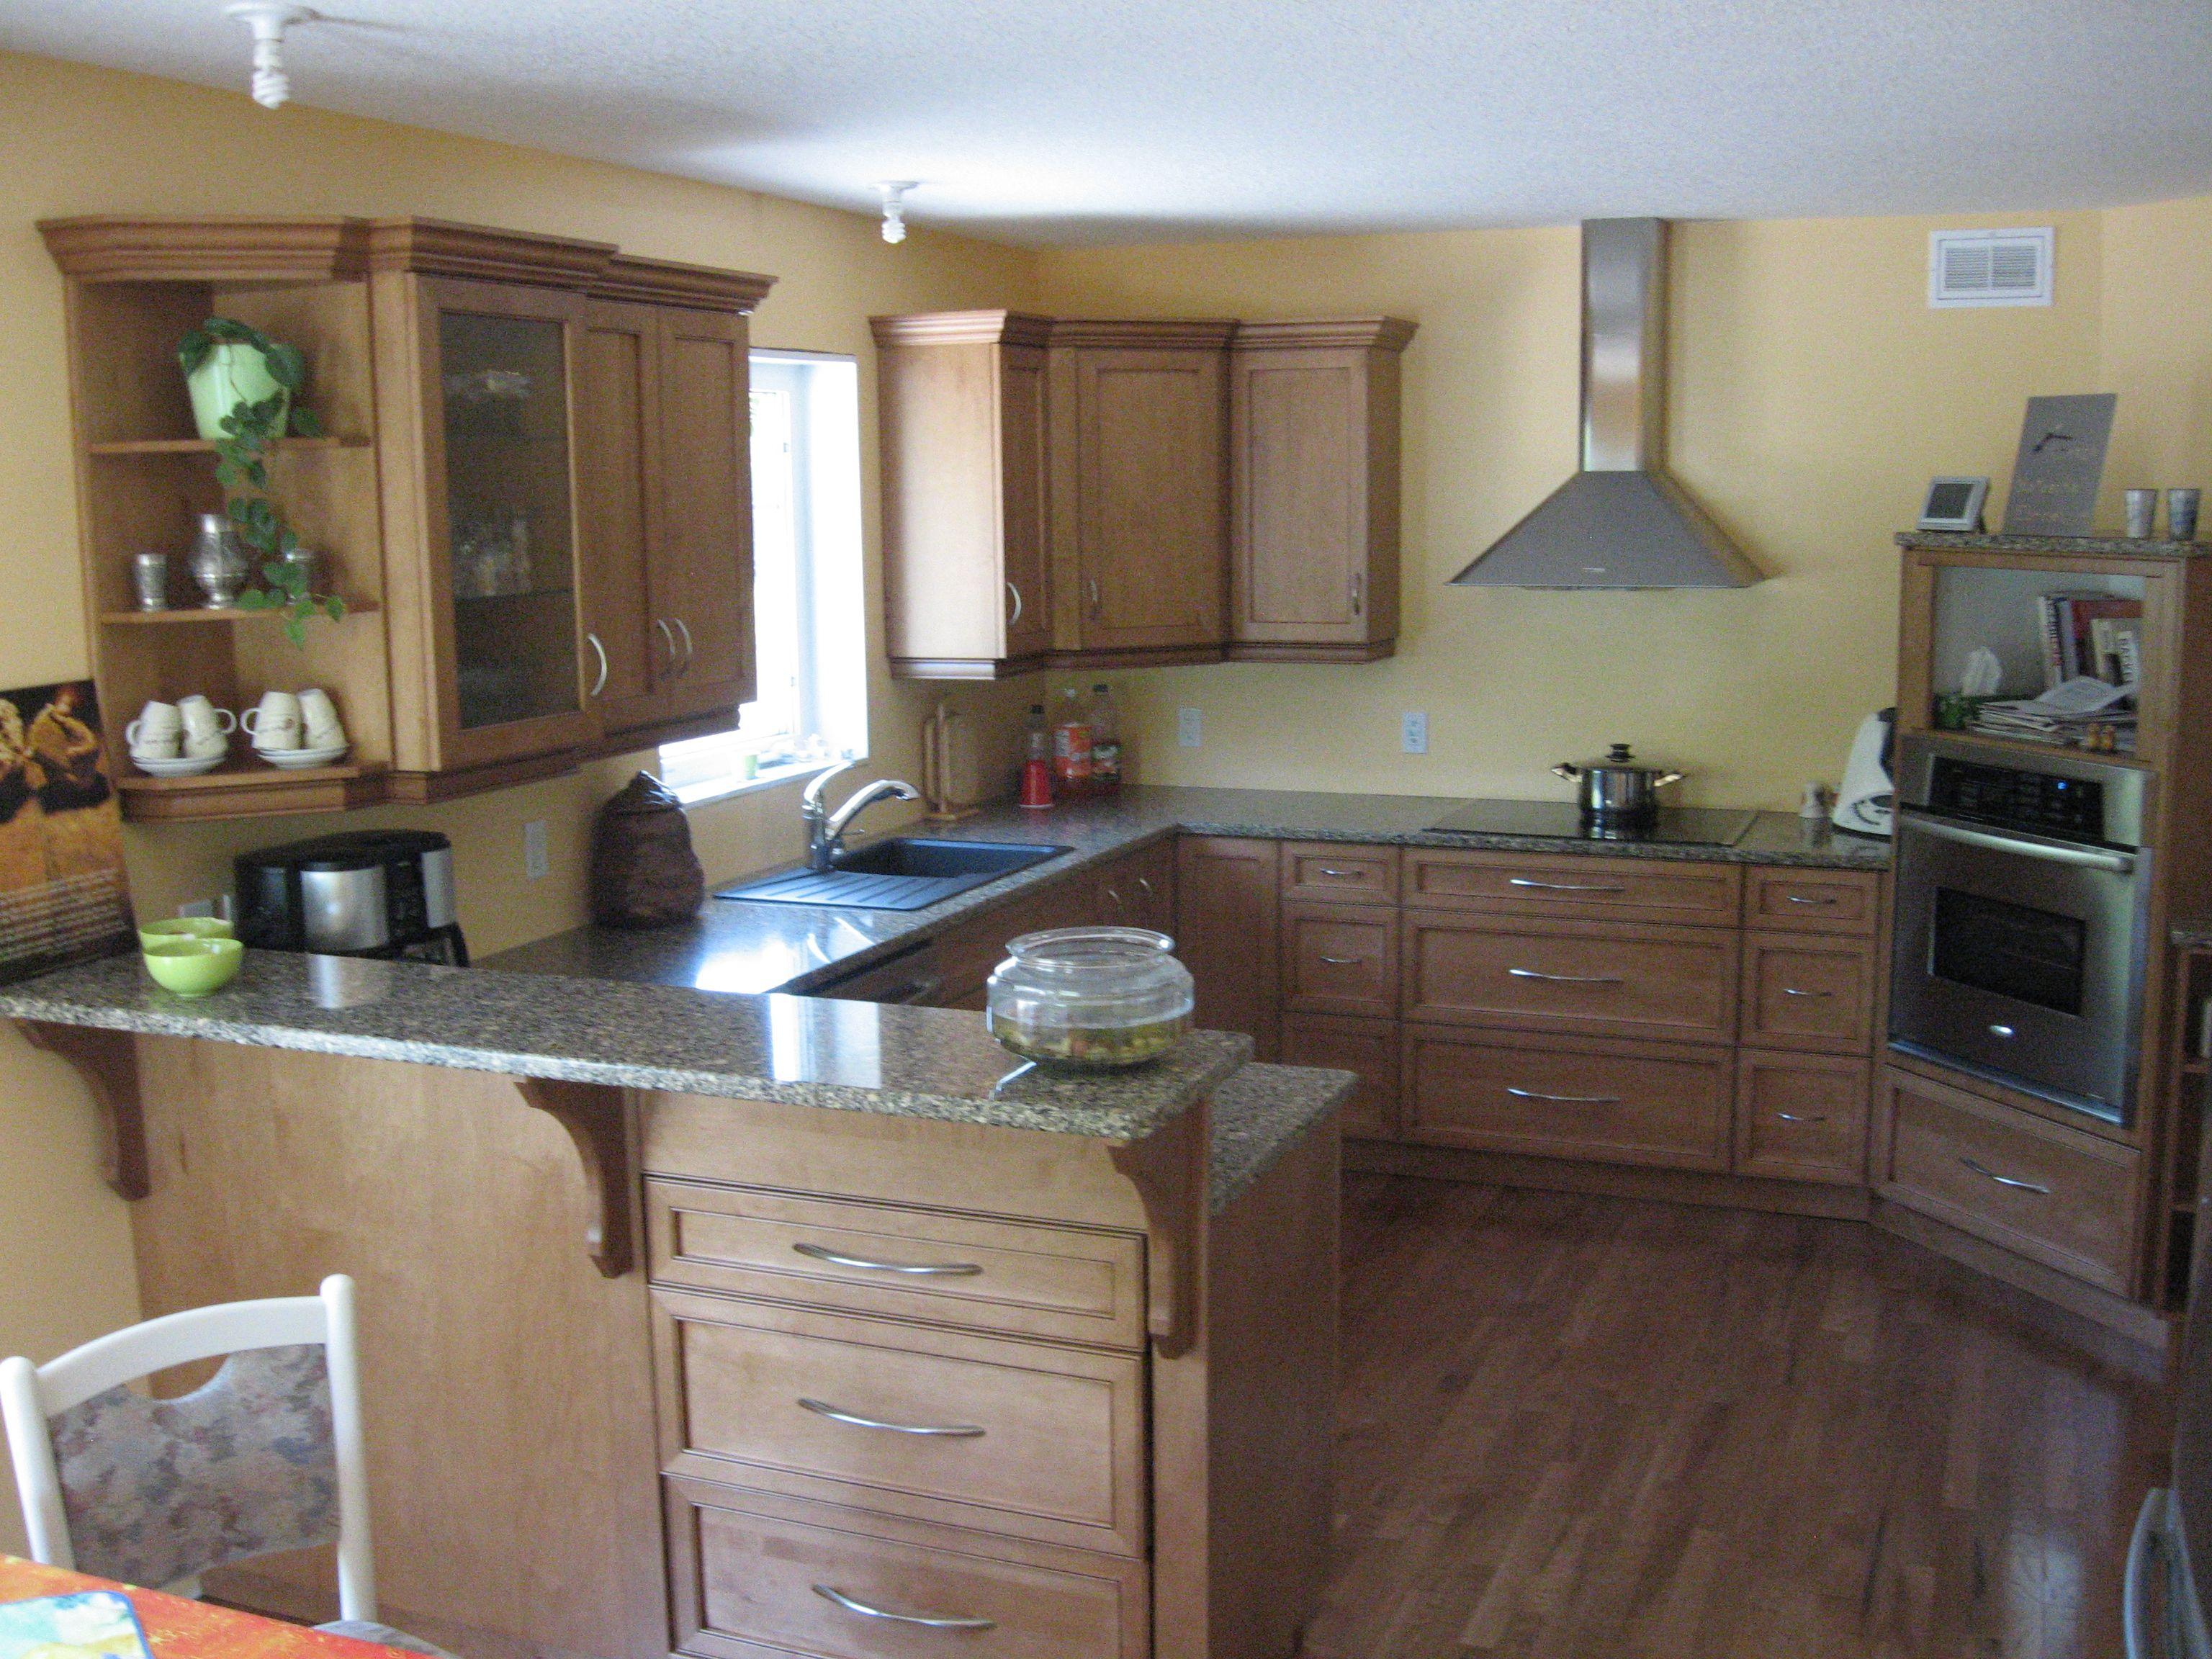 Cabinets: Maple - Wheatfield with Black Glaze / Countertop ... on Maple Kitchen Cabinets With Quartz Countertops  id=28850